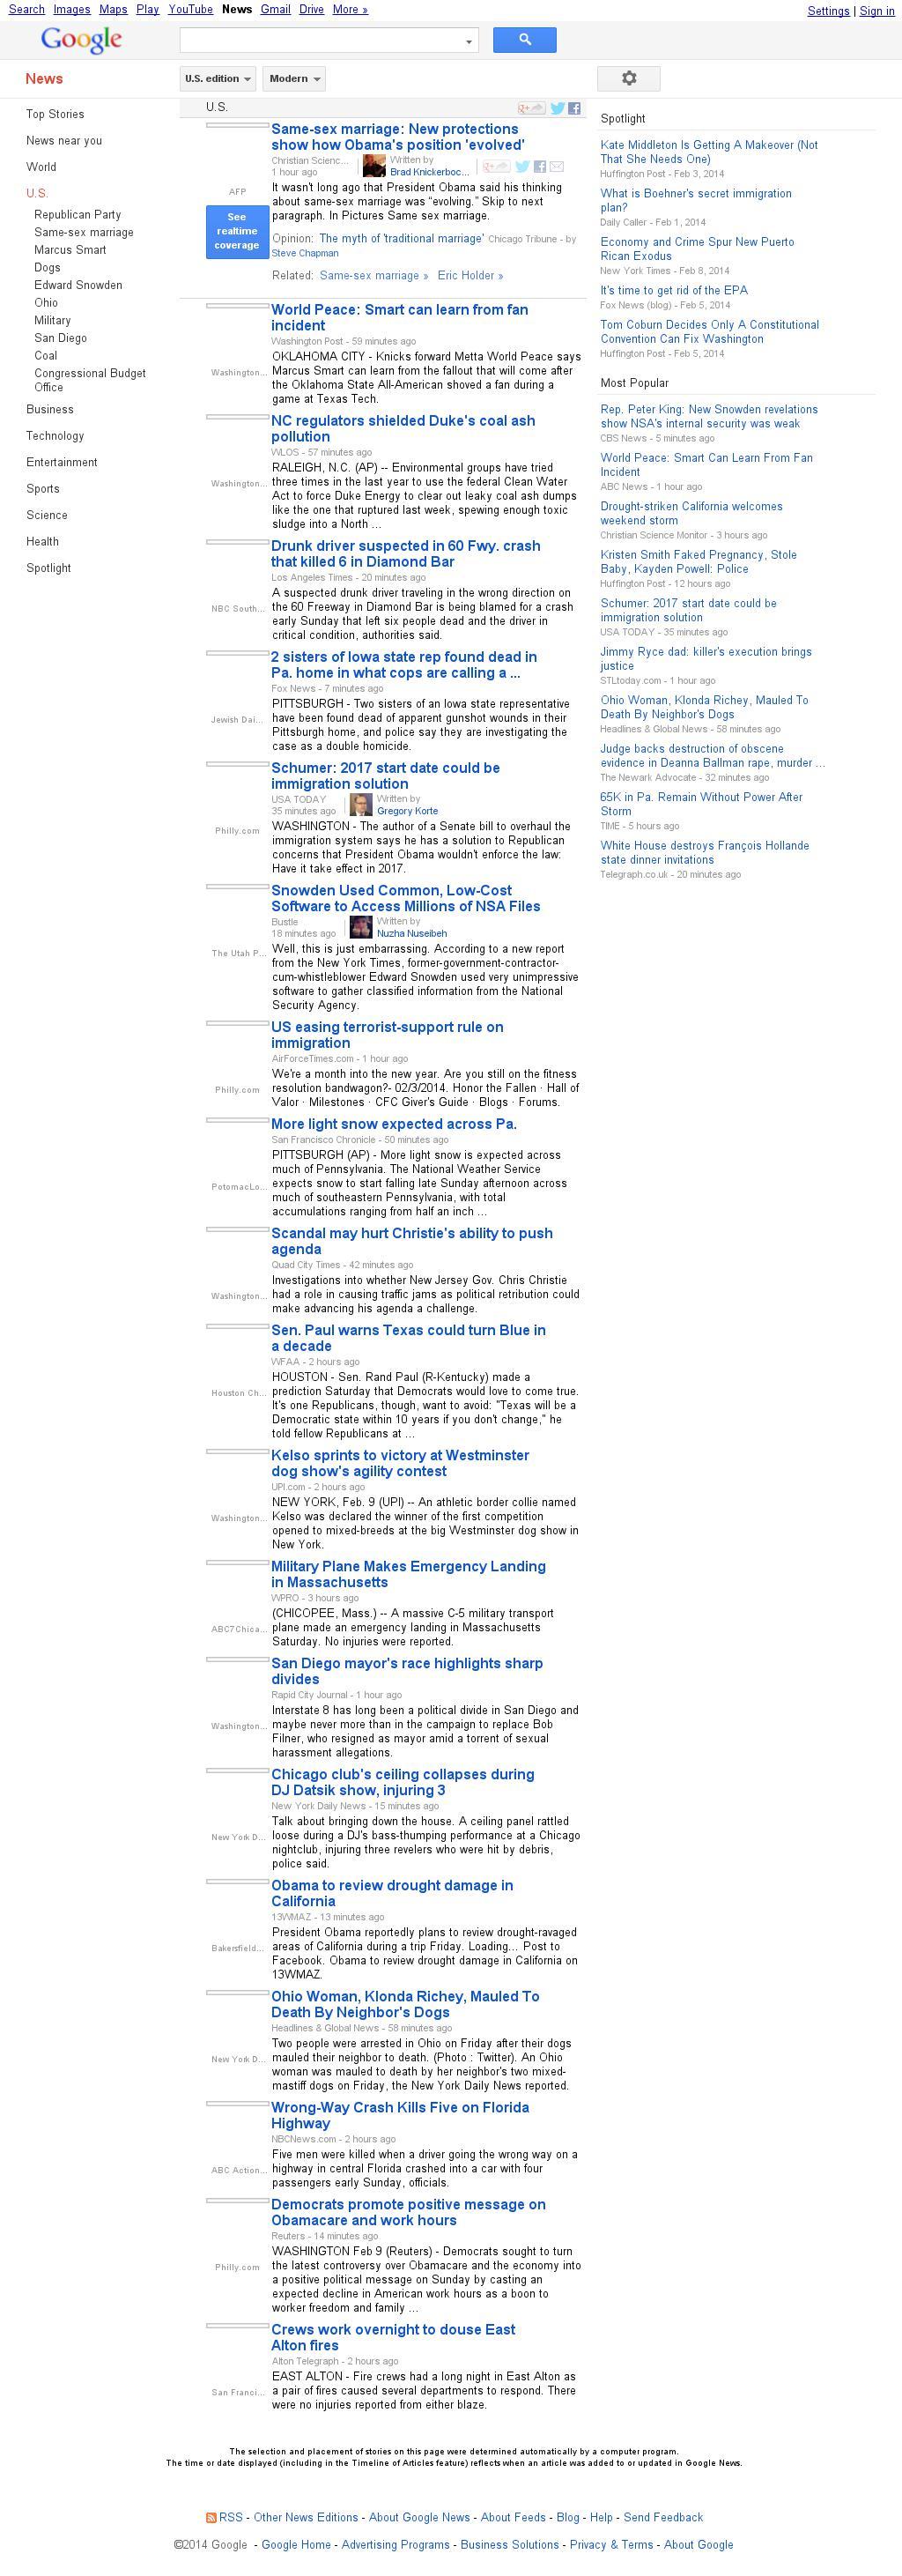 Google News: U.S. at Sunday Feb. 9, 2014, 7:07 p.m. UTC